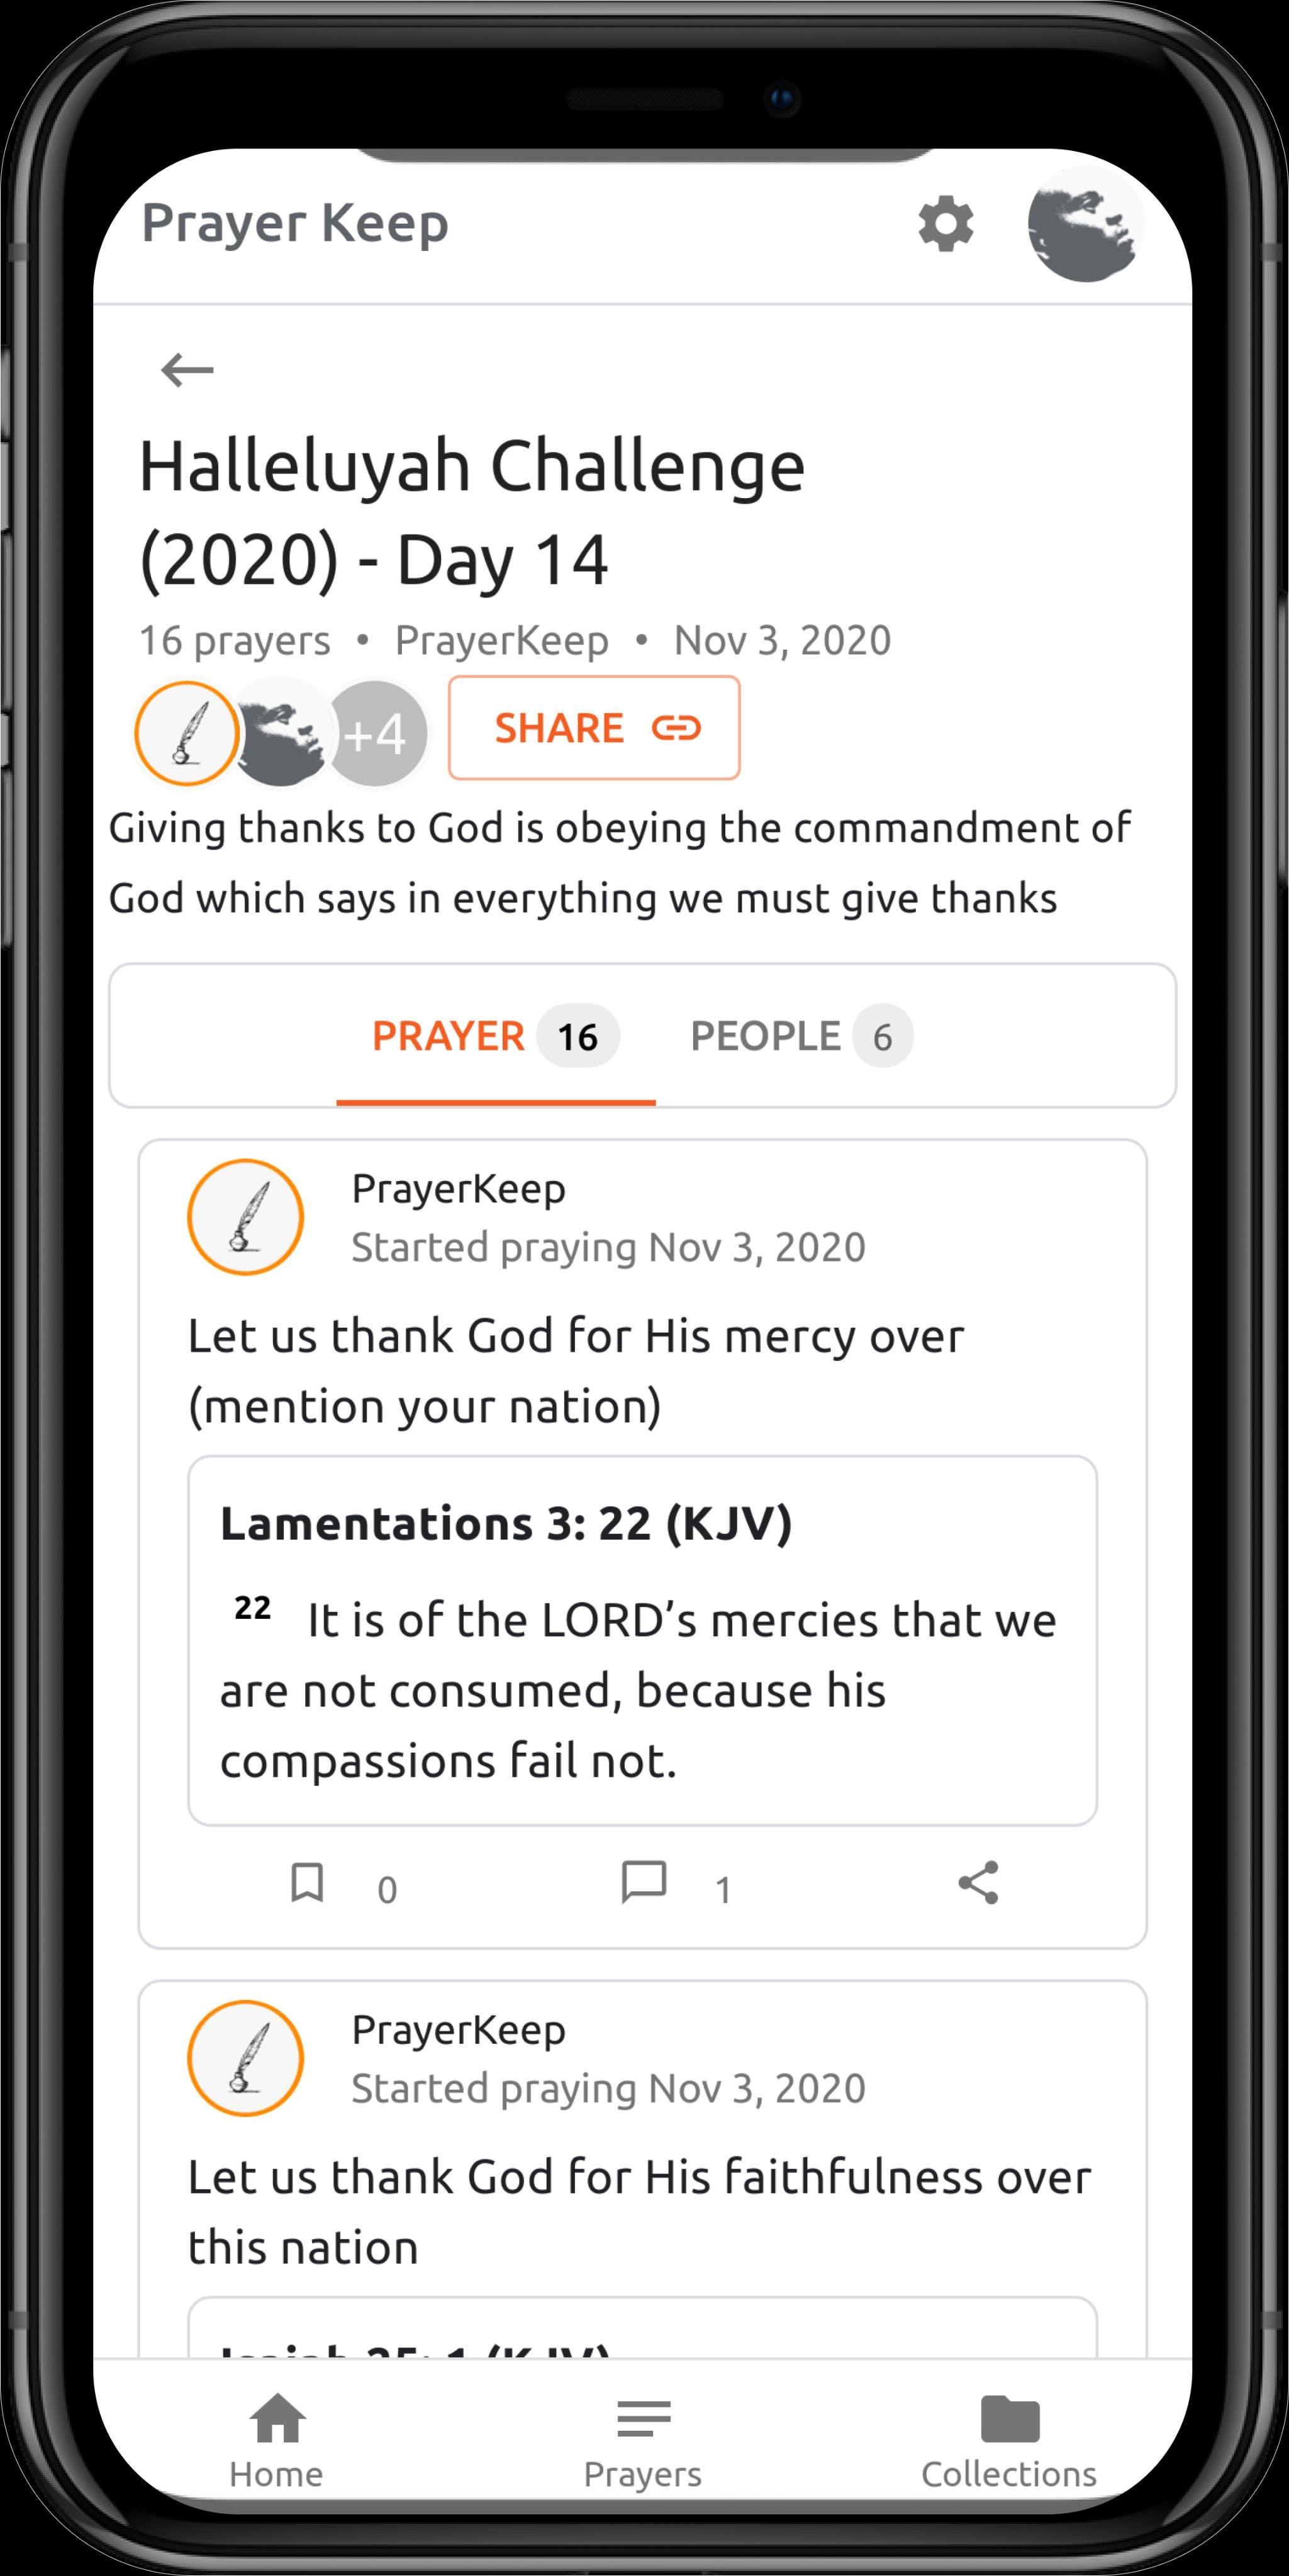 prayer-keep-collection-mobile.png